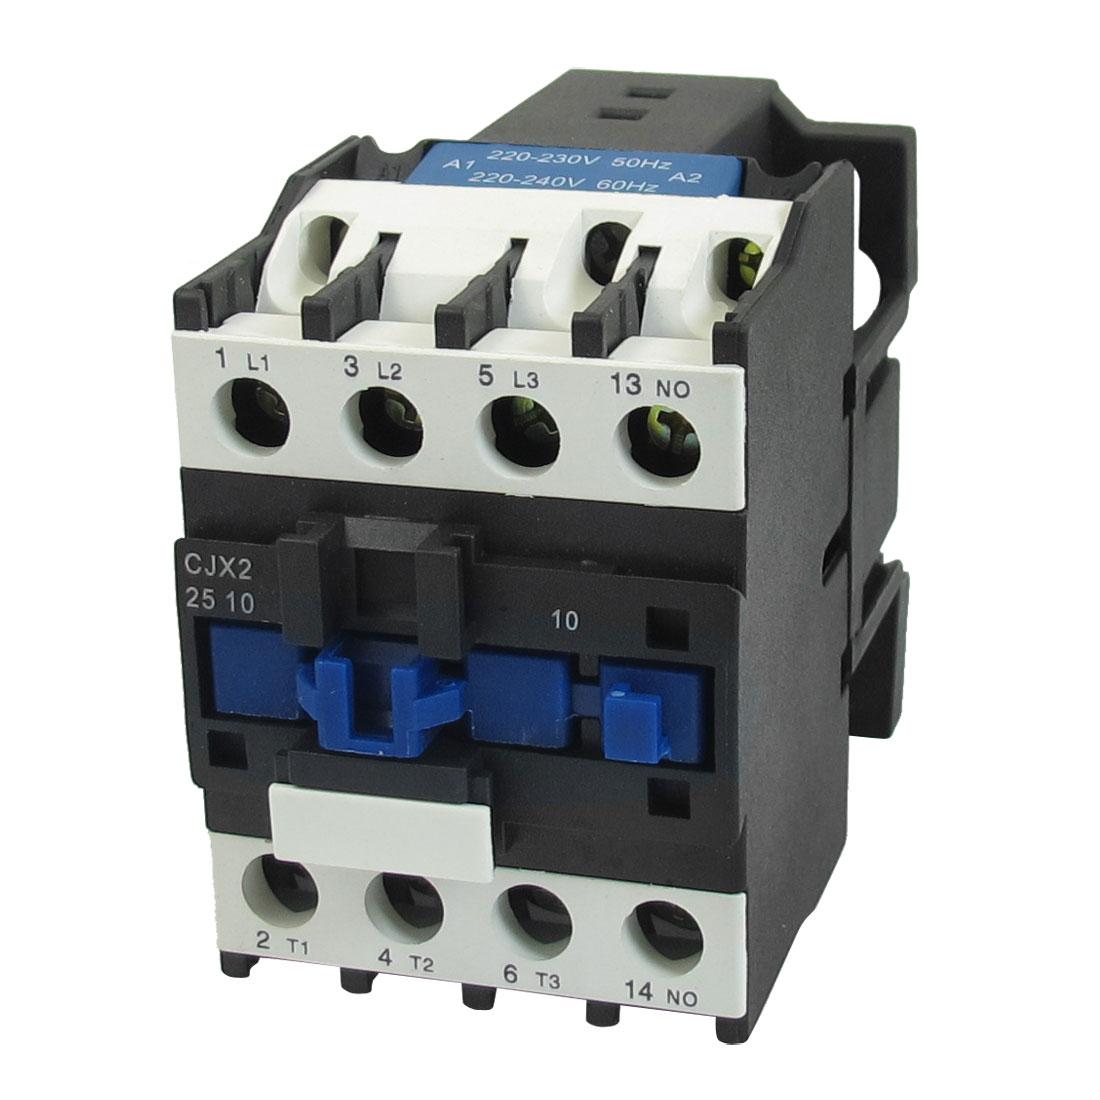 CJX2-2510 220-240V 50/60Hz 3Poles 1NO Overload Protection AC Contactor